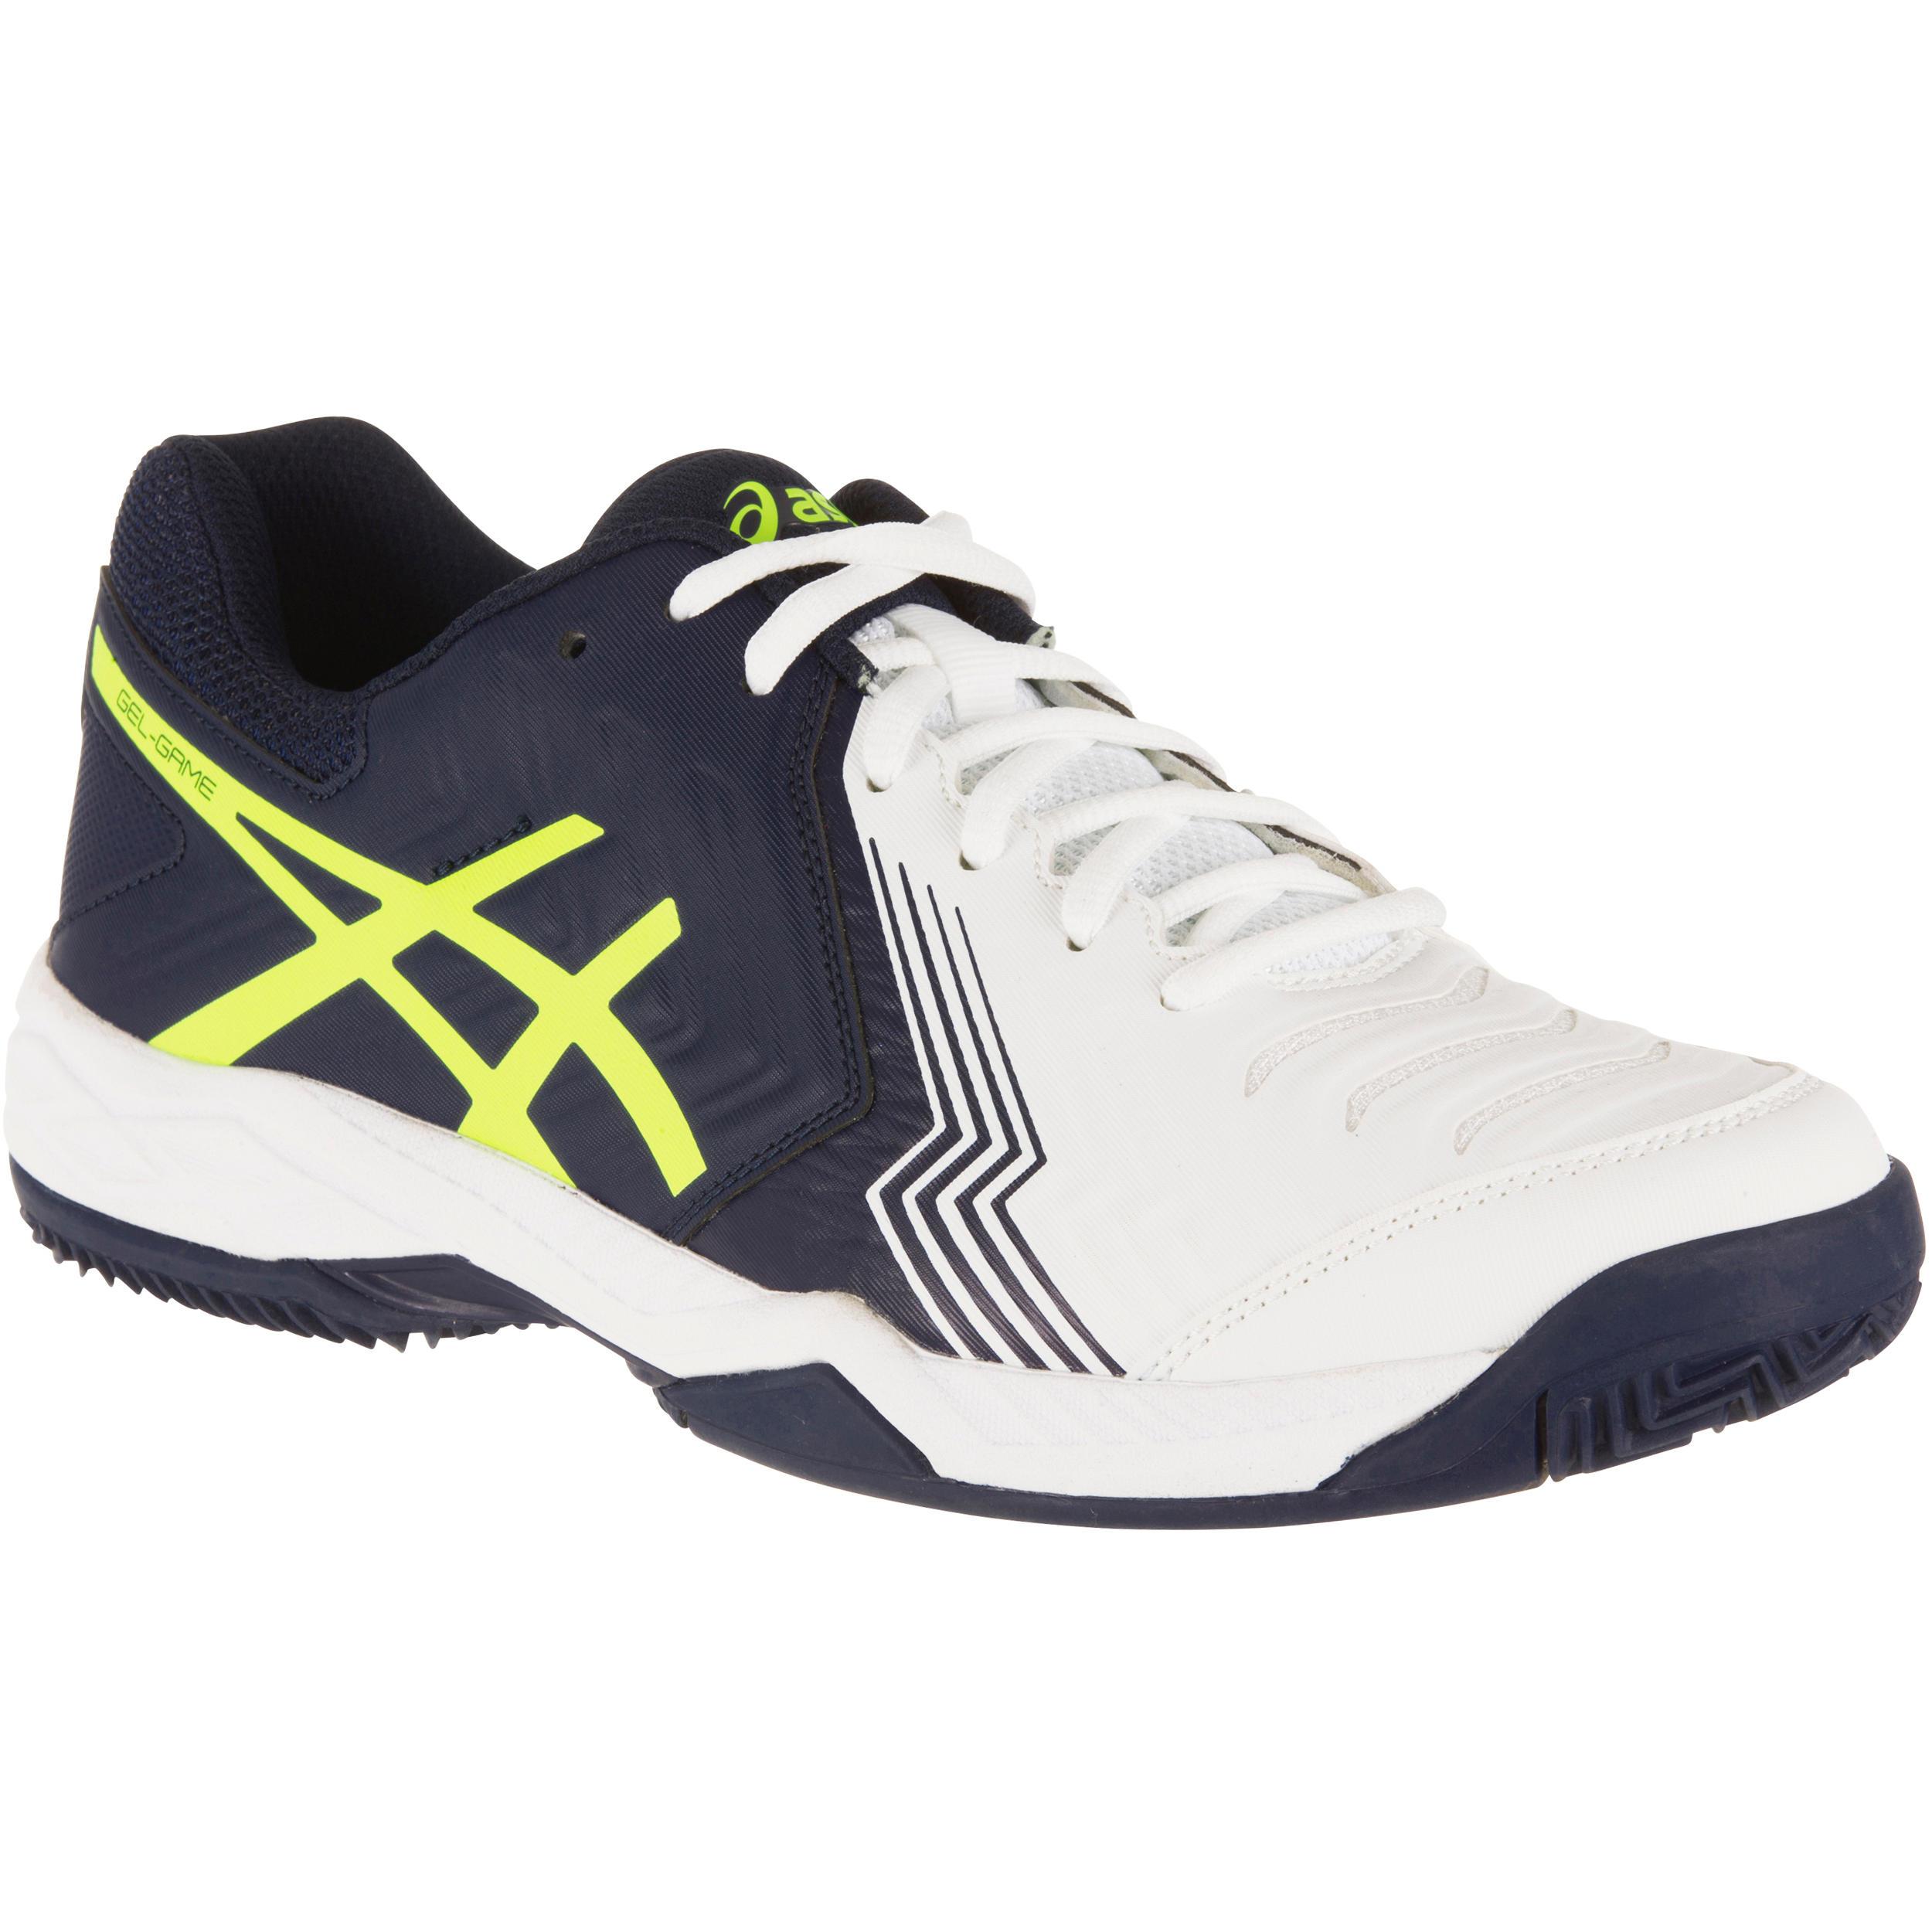 9e06097a0fba chaussures tennis terre battue decathlon,chaussures tennis junior decathlon,chaussures  tennis pour terre battue,chaussures tennis nike ...